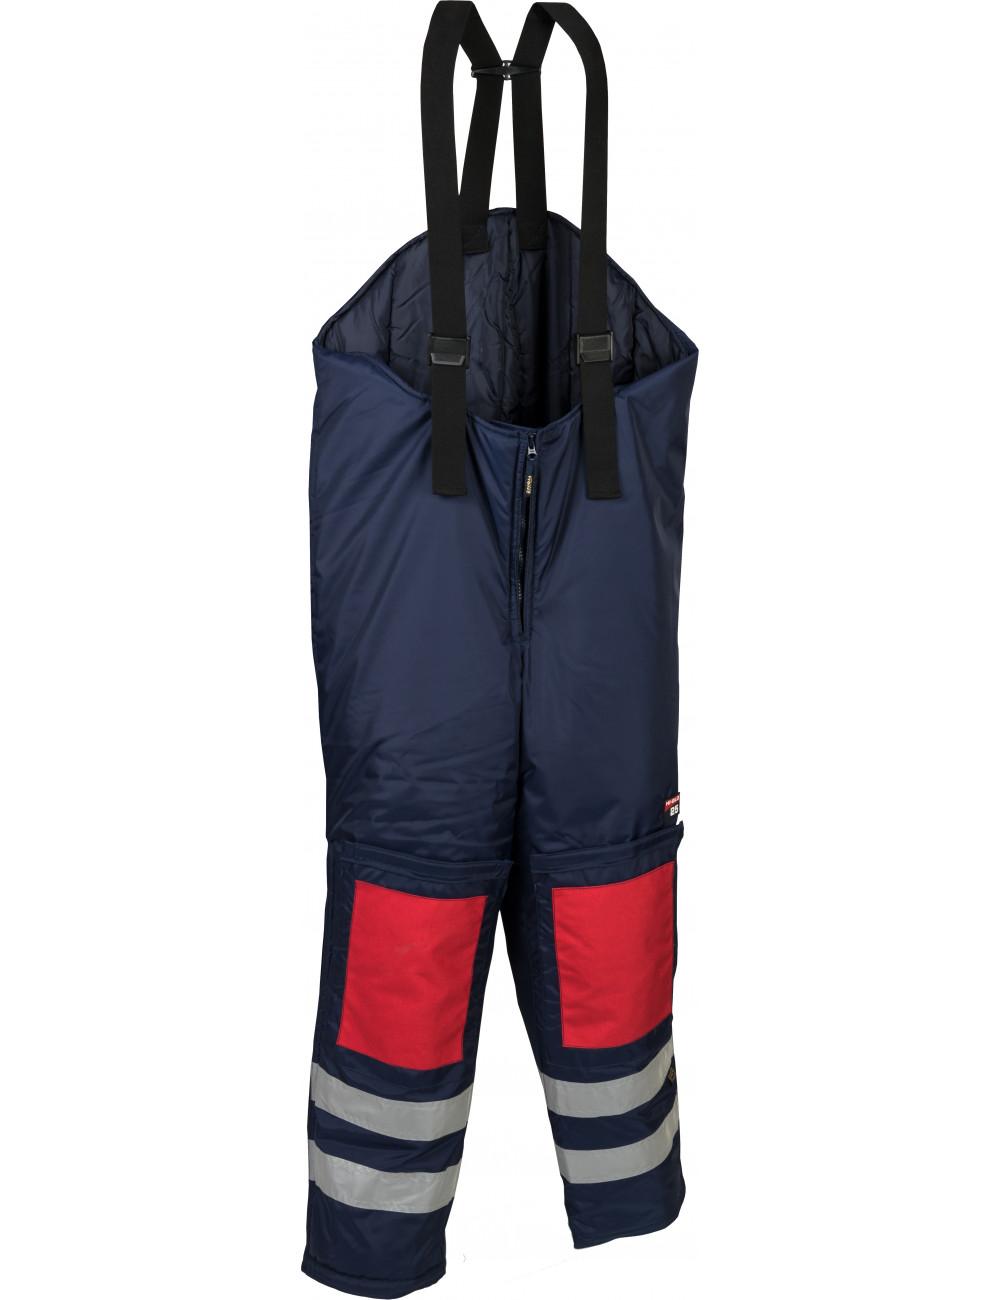 Spodnie do mroźni i chłodni Hi-Glo 25 Coldstore Trousers Goldfreeze, do -64,2 ° C